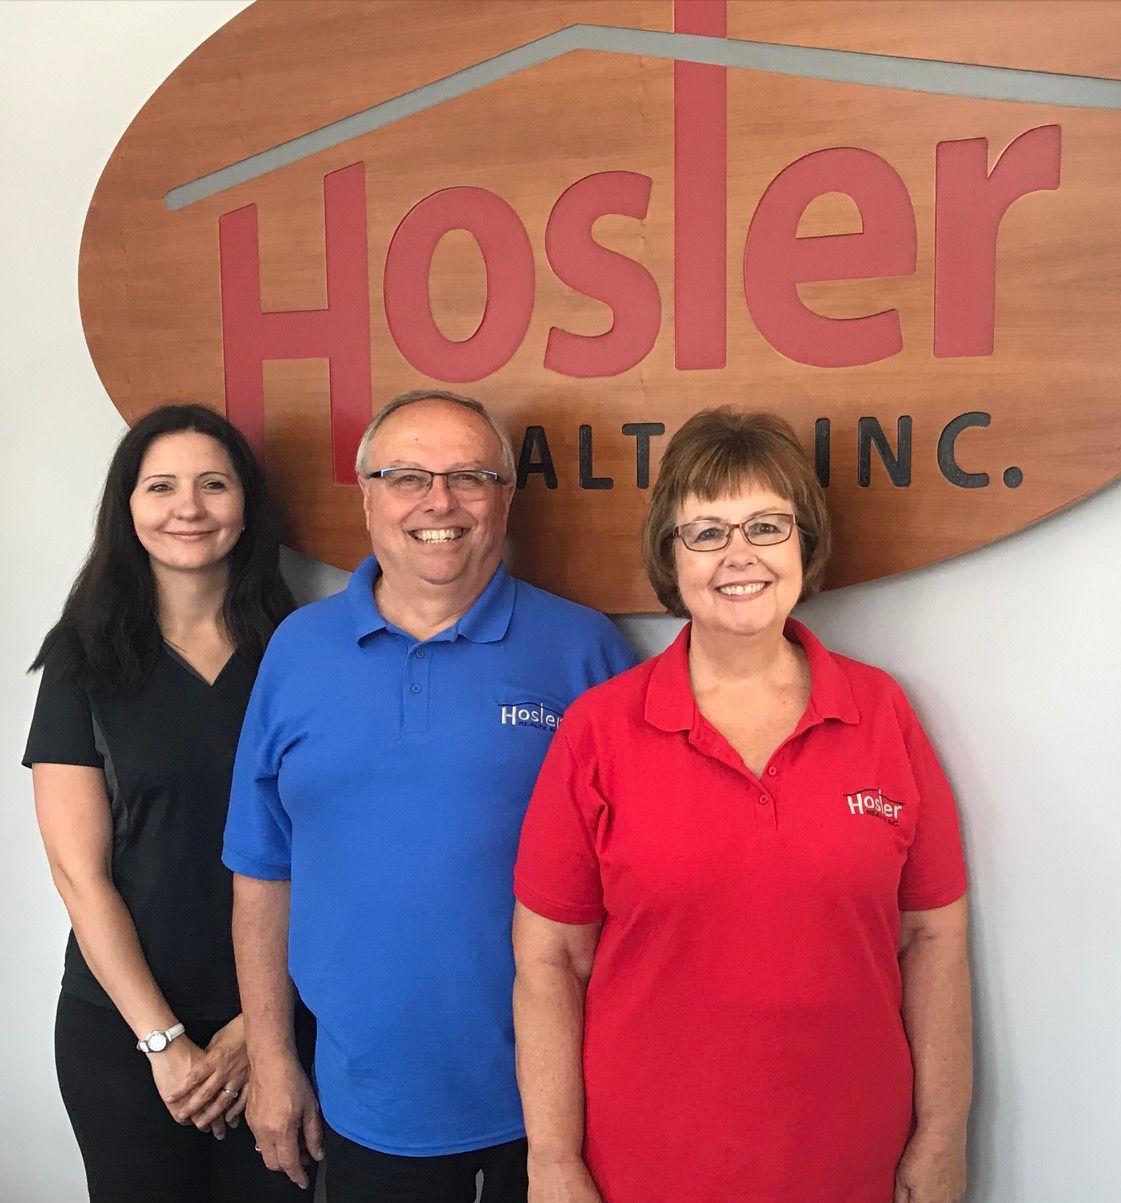 Hosler Realty associate brokers